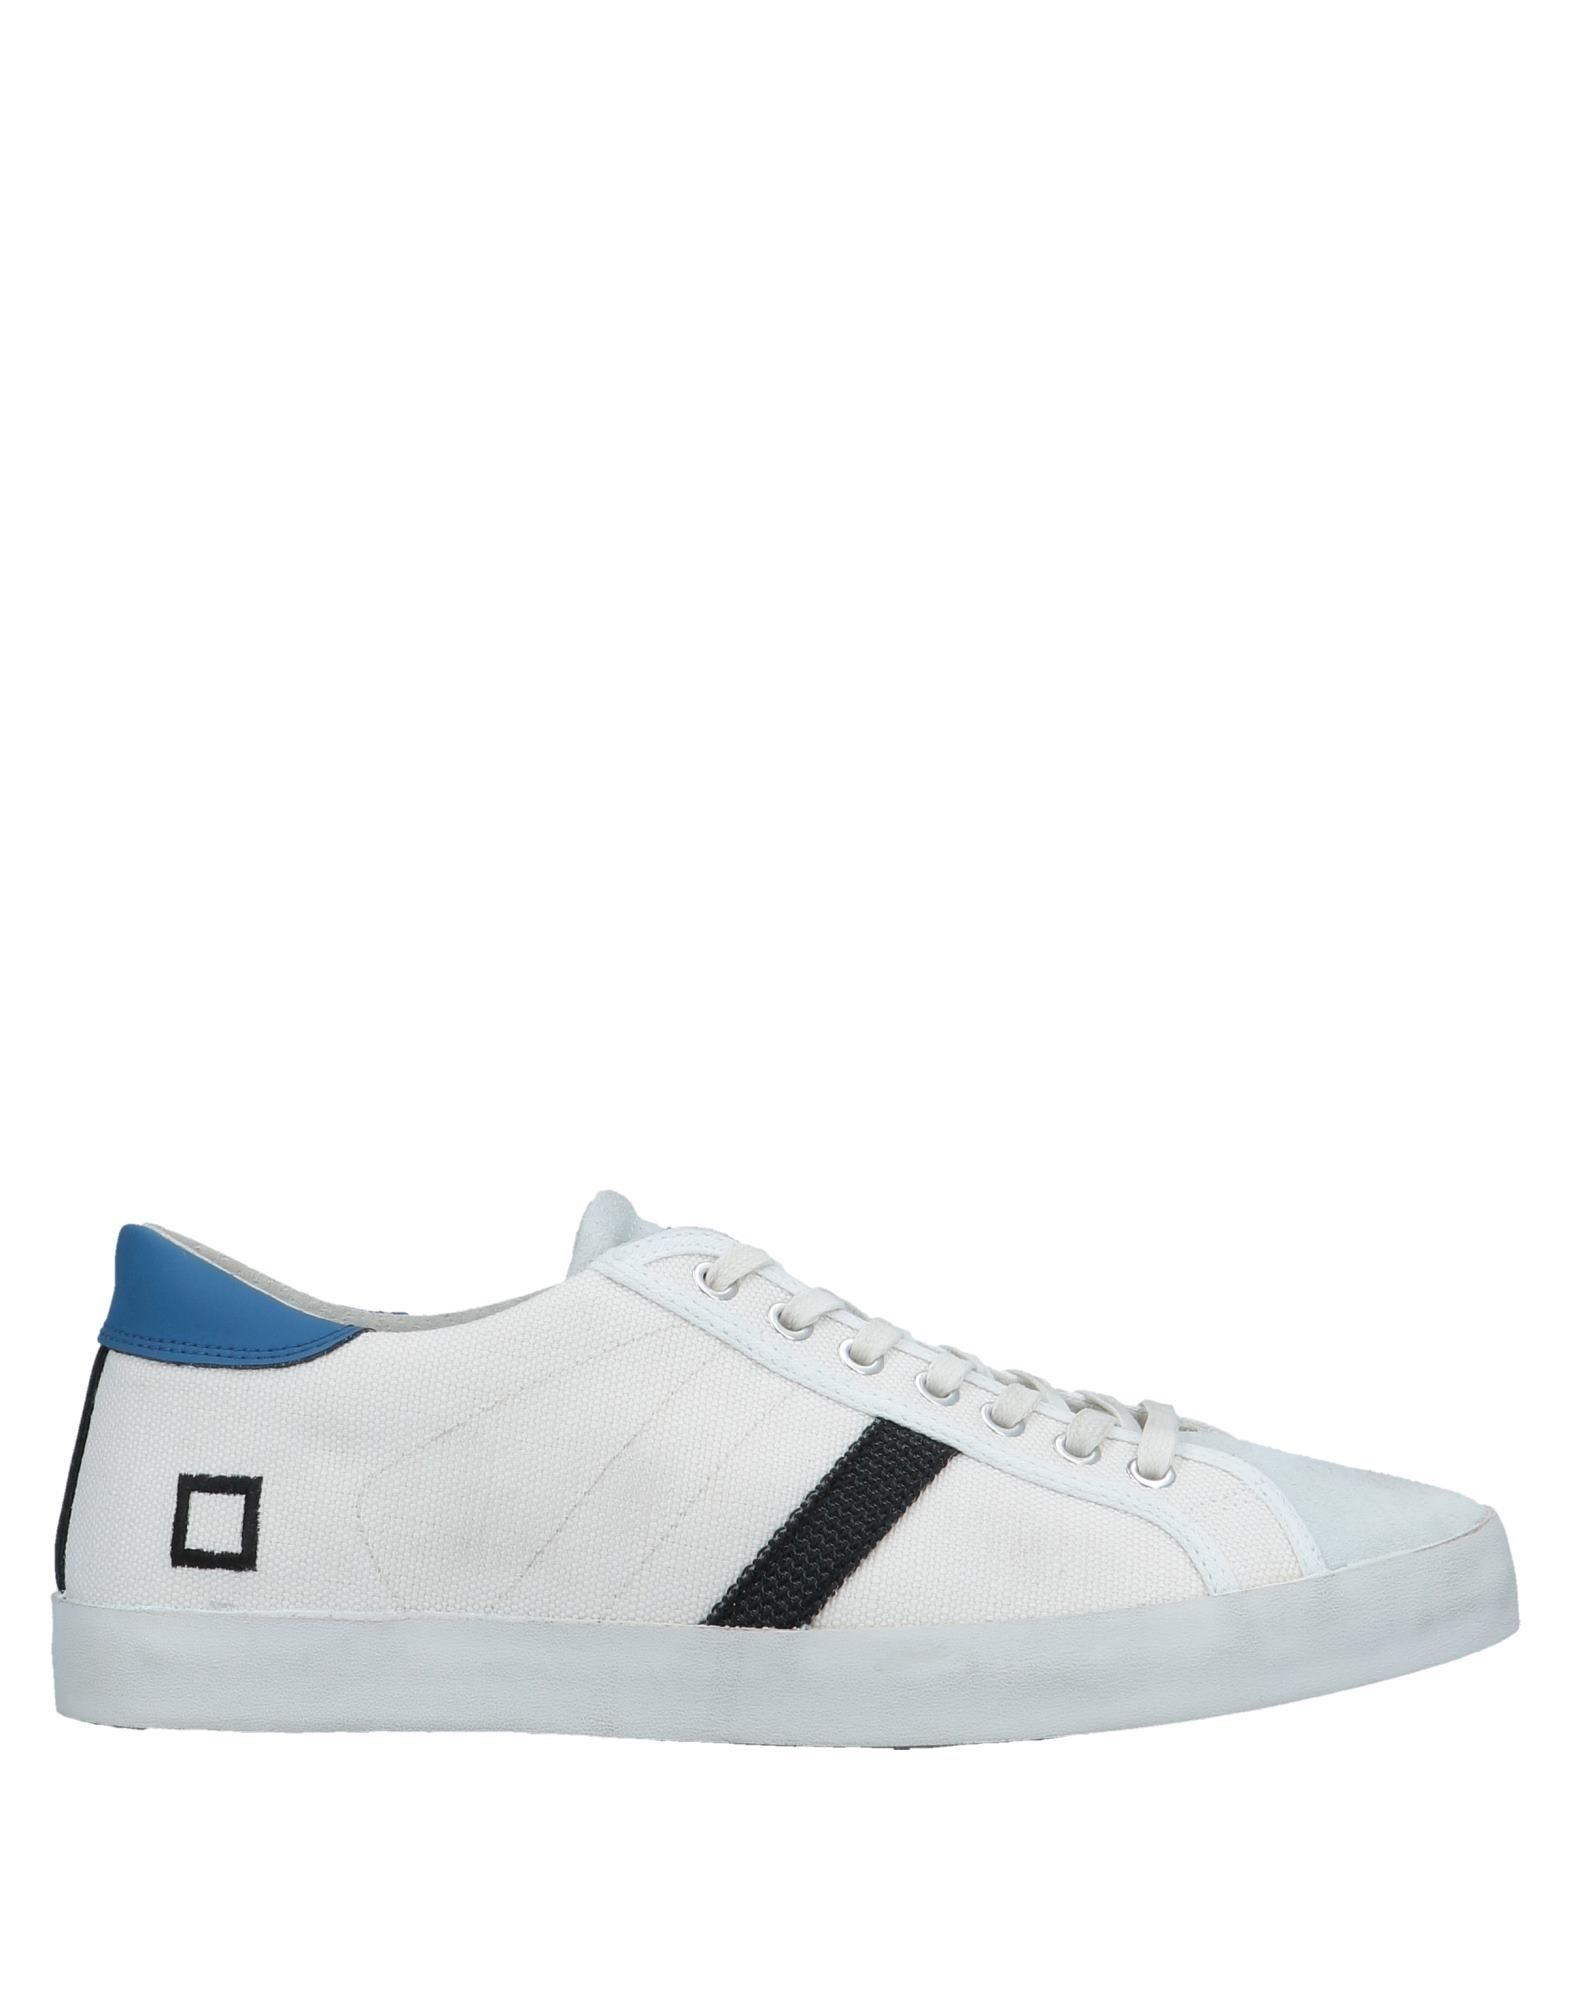 D.A.T.E. Sneakers Herren  11554559UD